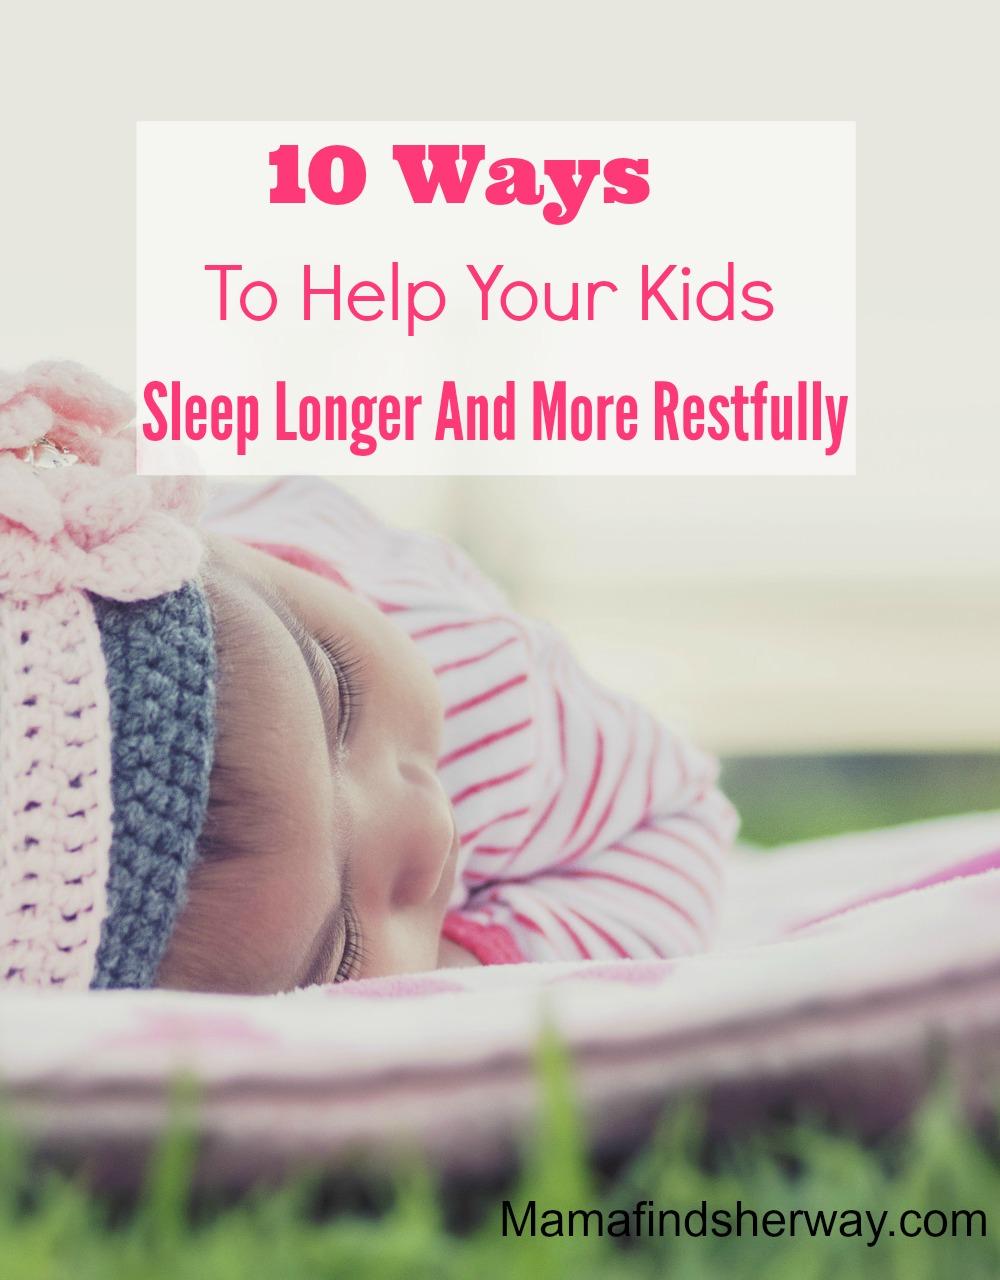 10 Ways To Help Your Kids Sleep Longer